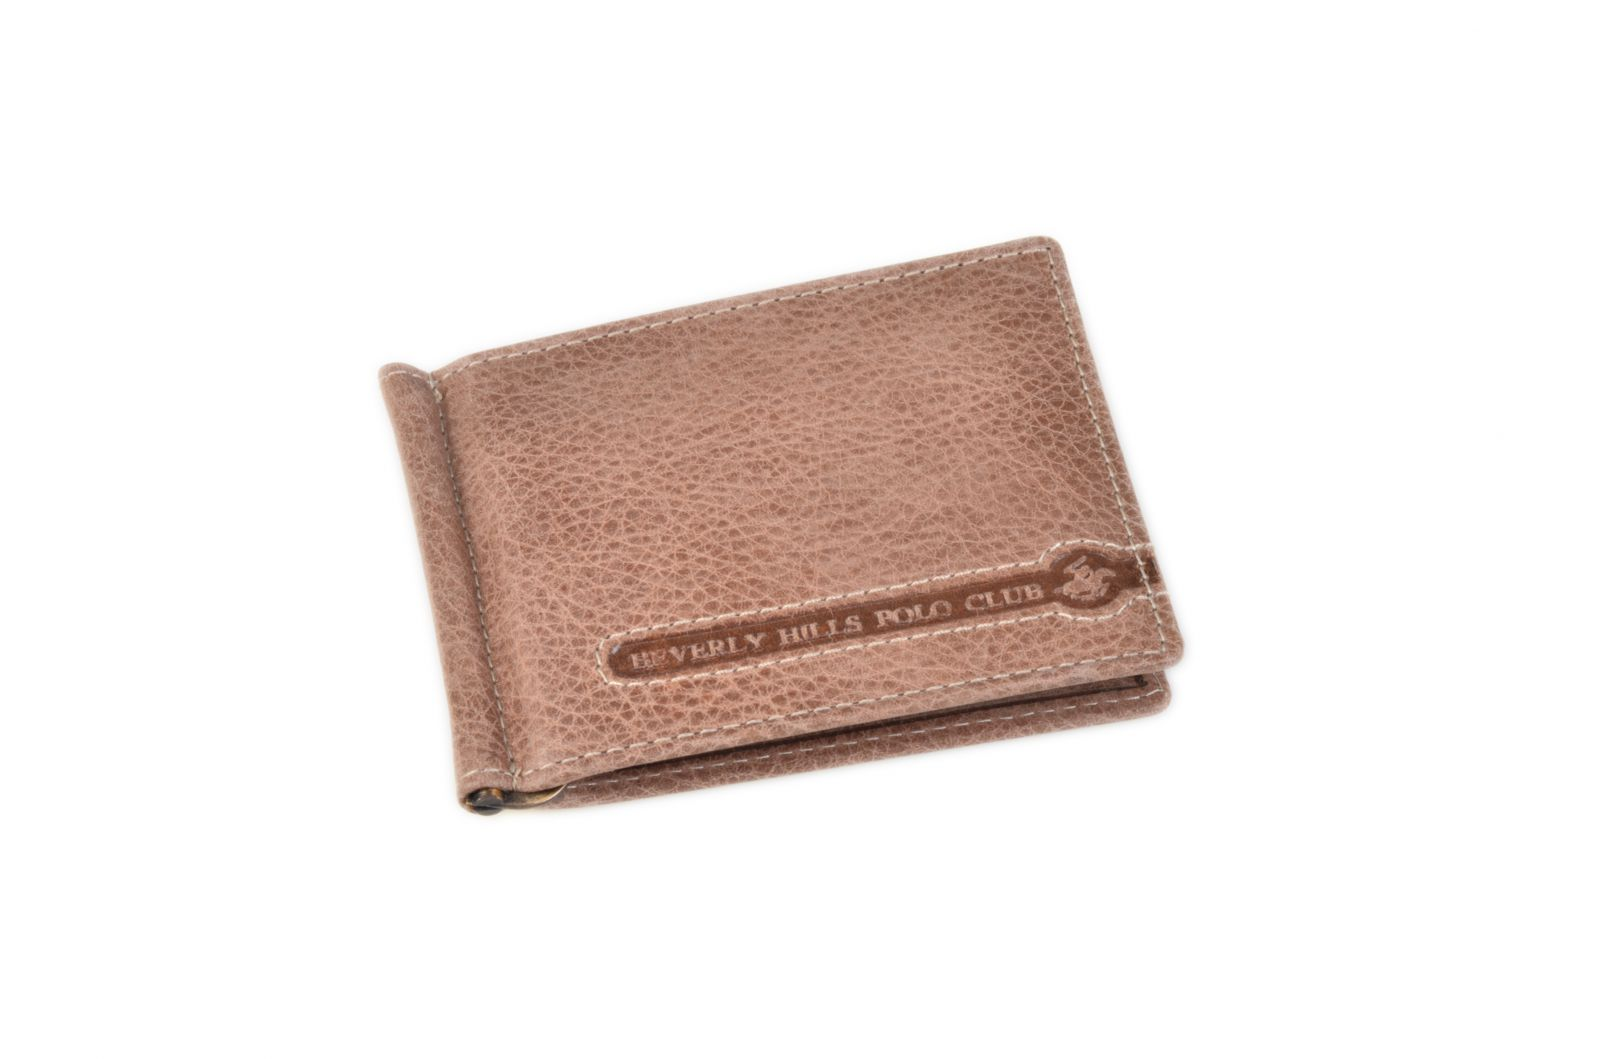 Celokožená pánská peněženka / dolarovka BHPC Tucson BH-398-25 hnědá